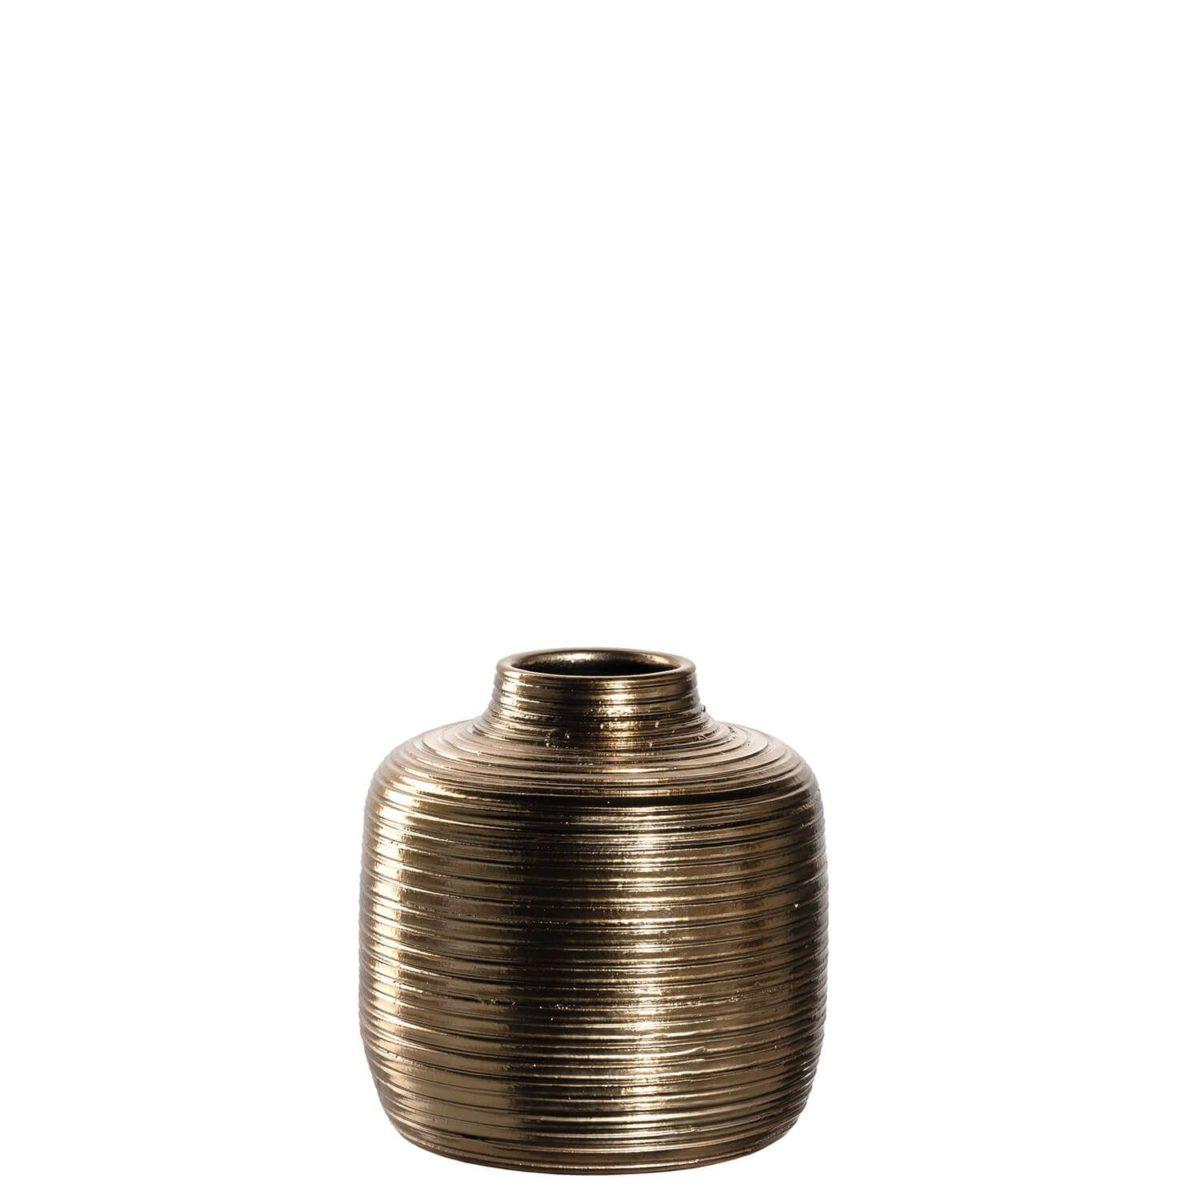 041339 0 k 1200x1200 - Vaza Decora LEONARDO (L041339)